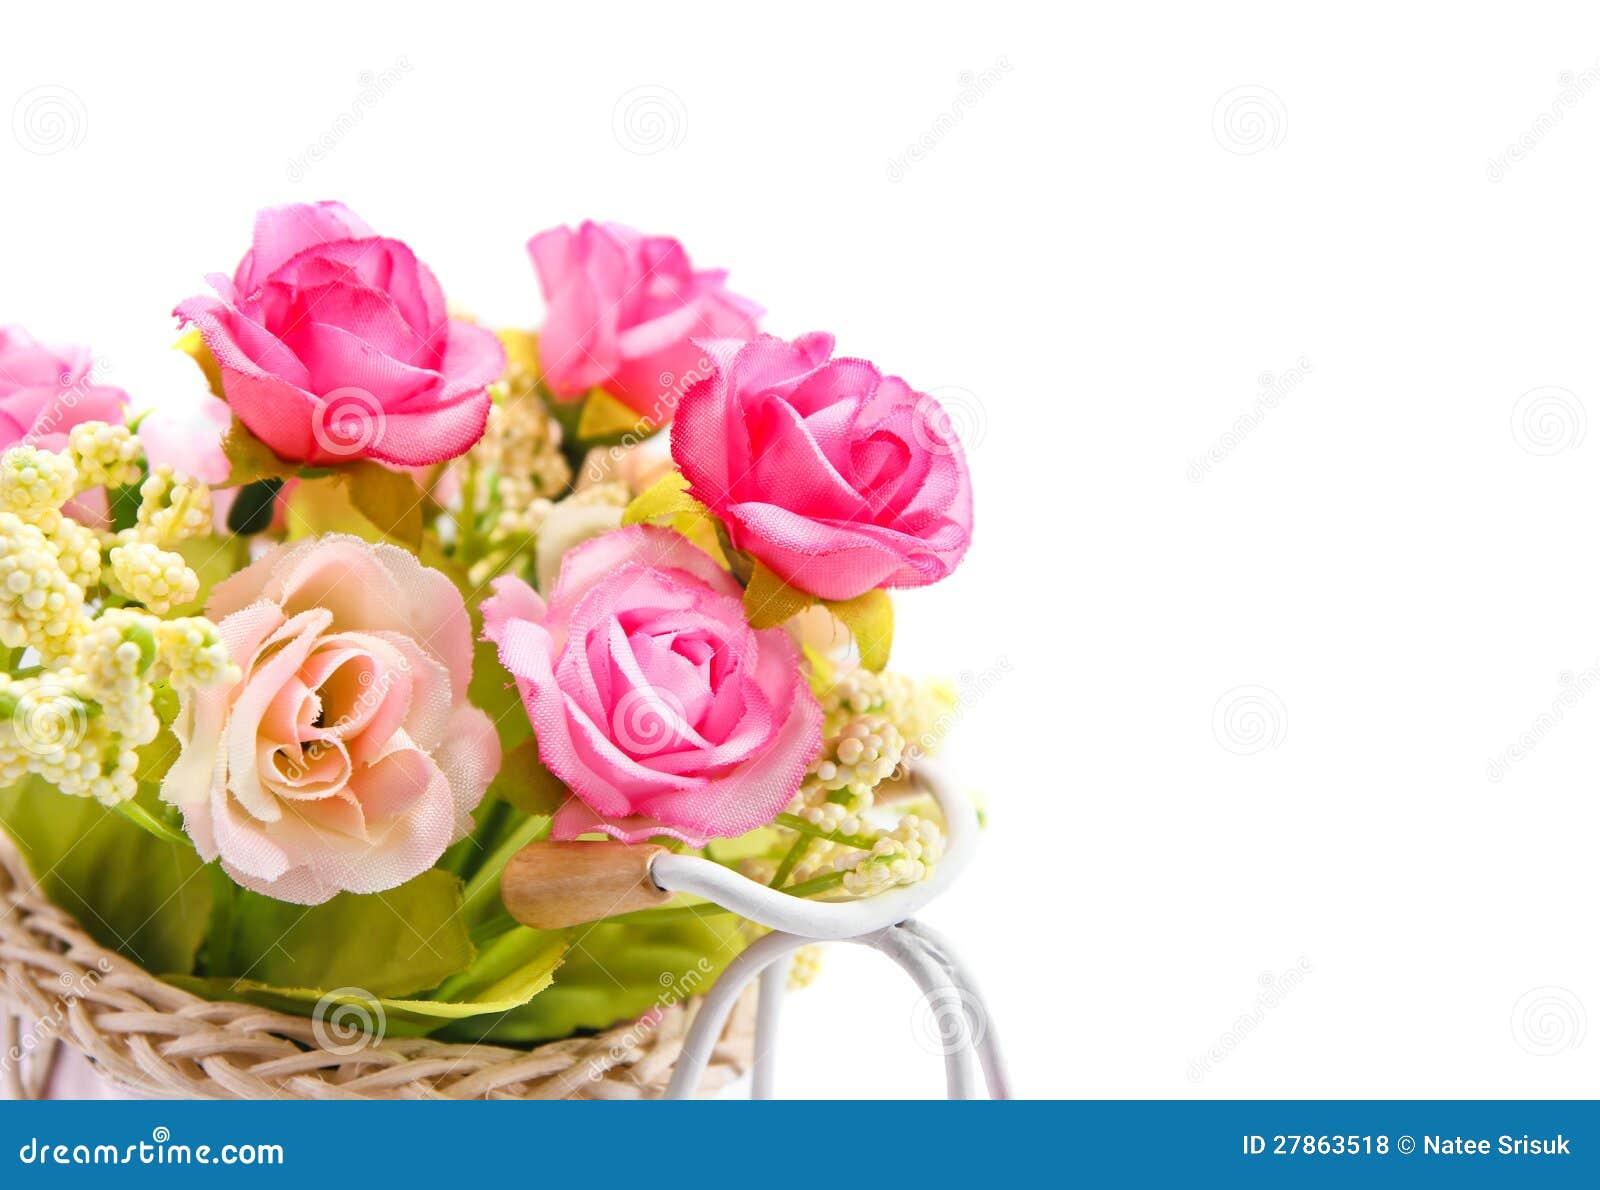 Kwiaty na biały tle